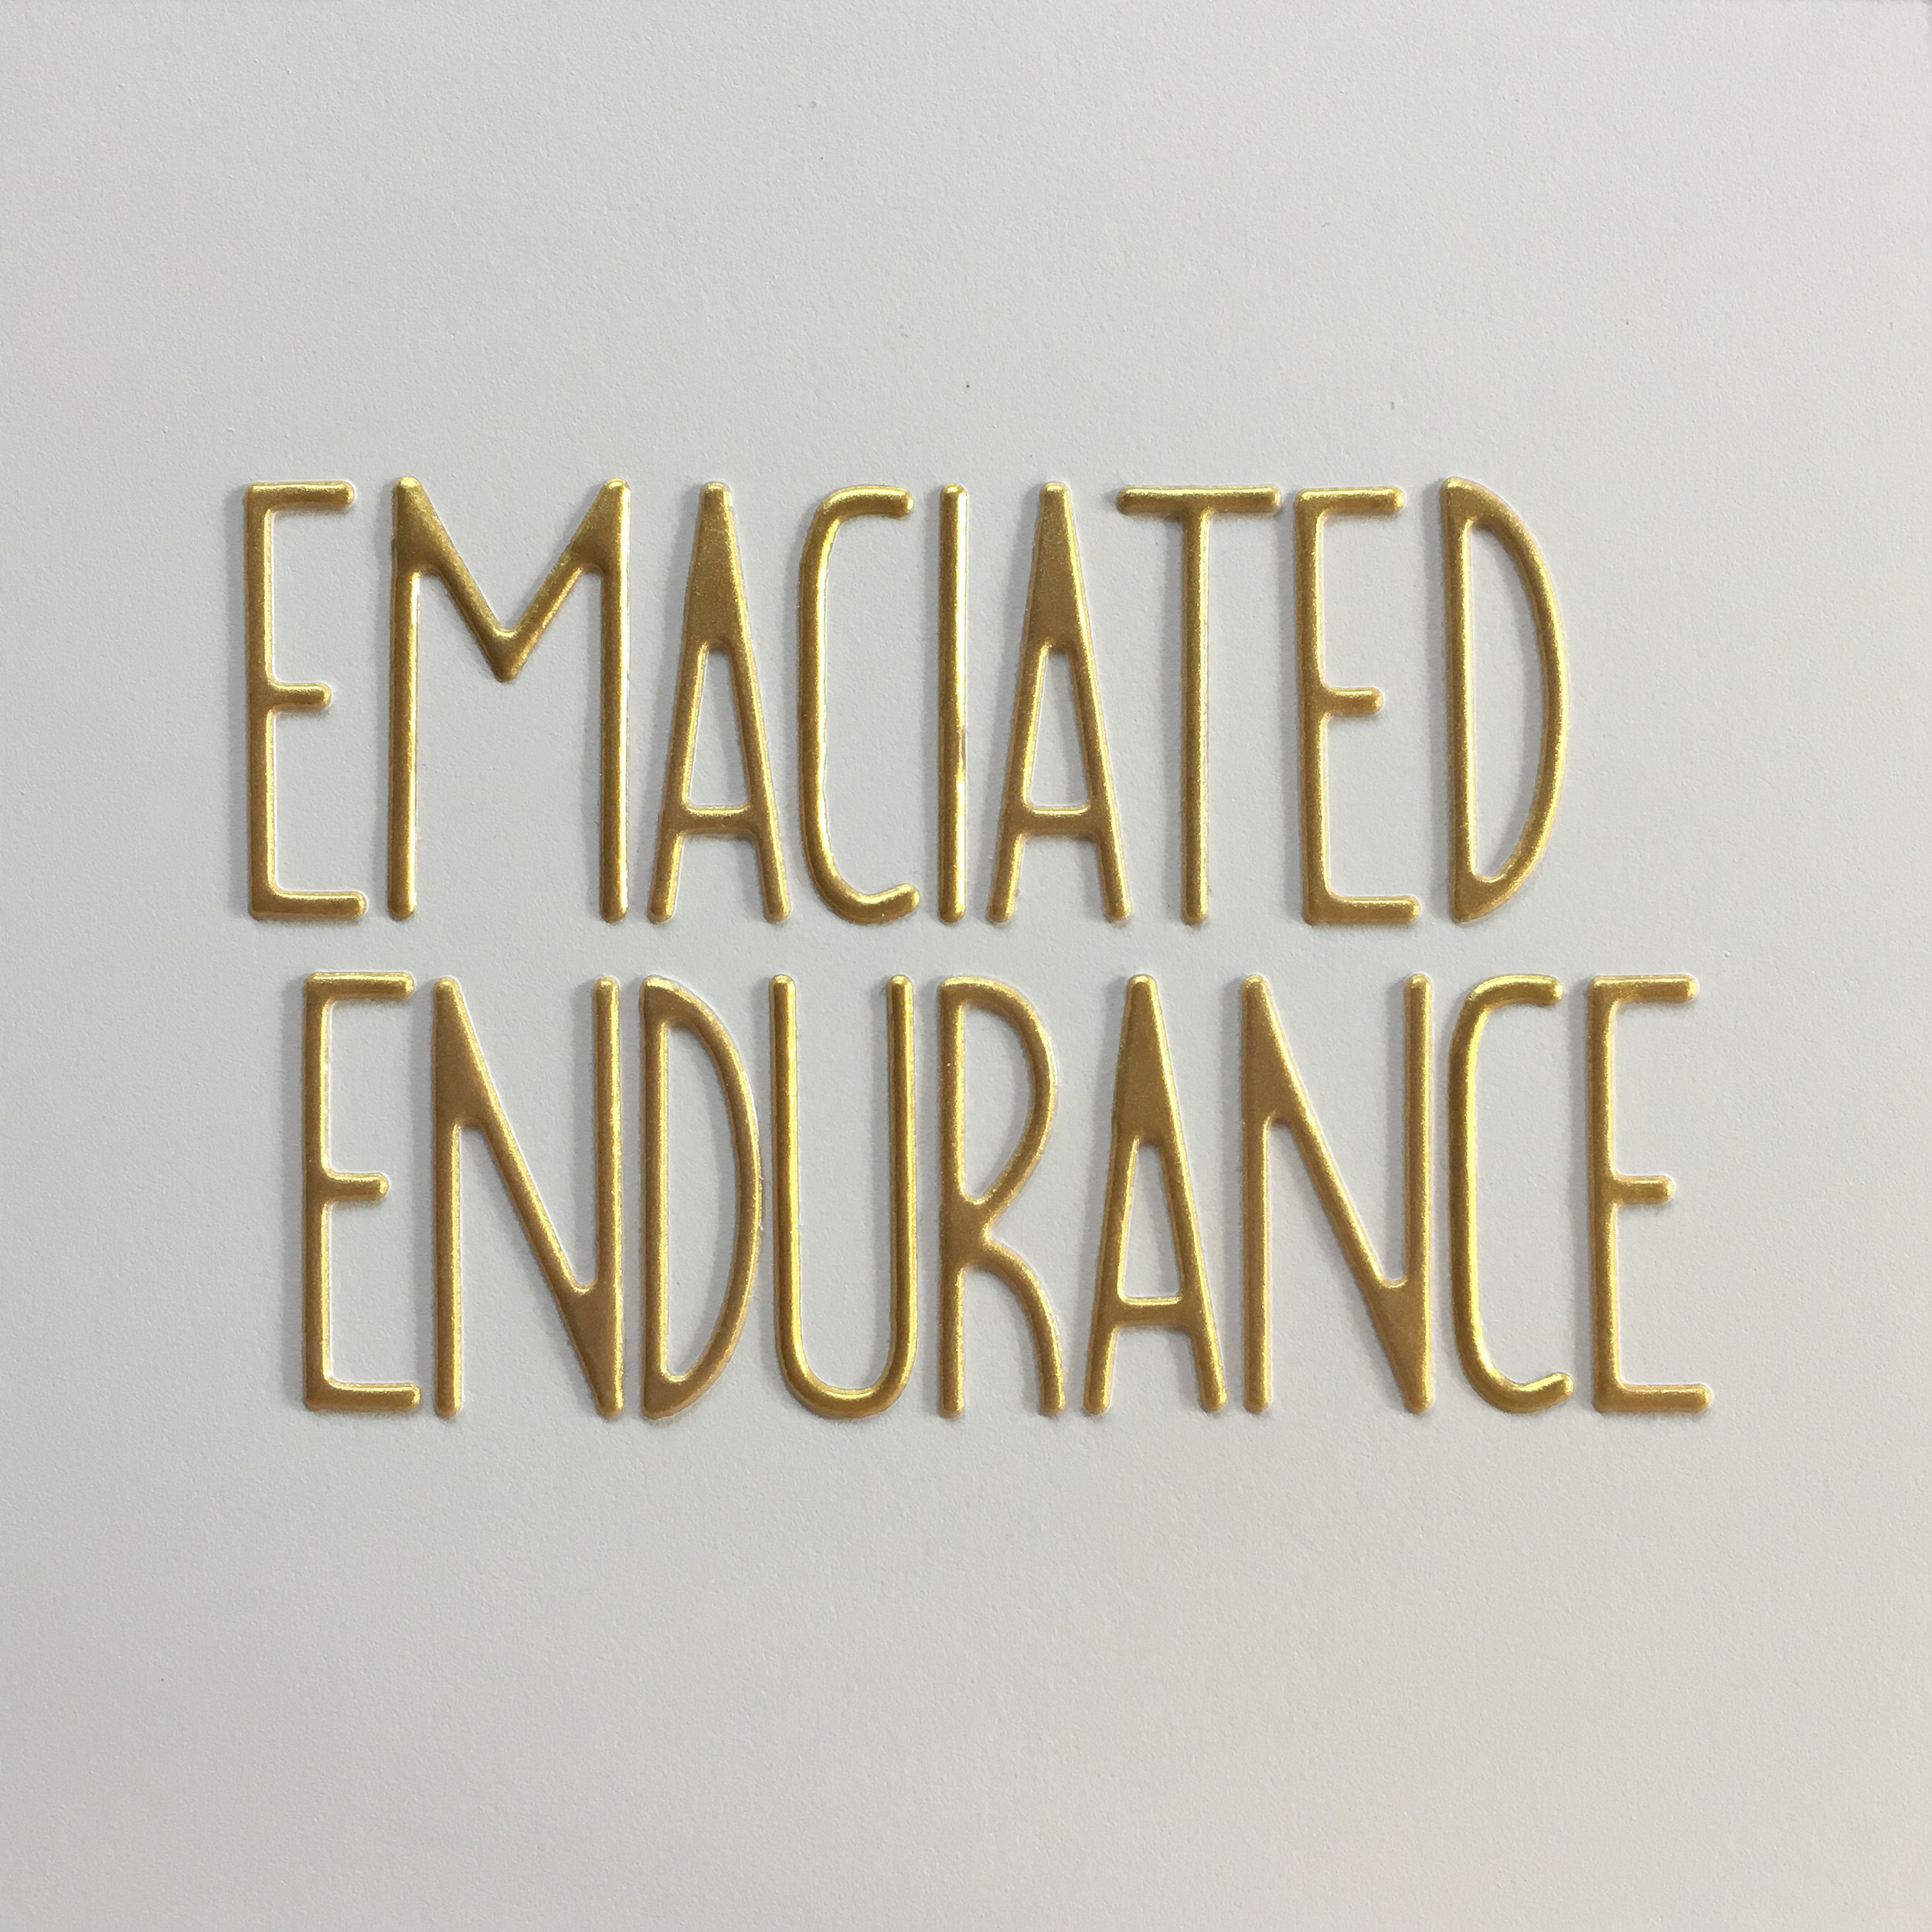 emaciated endurance.jpg